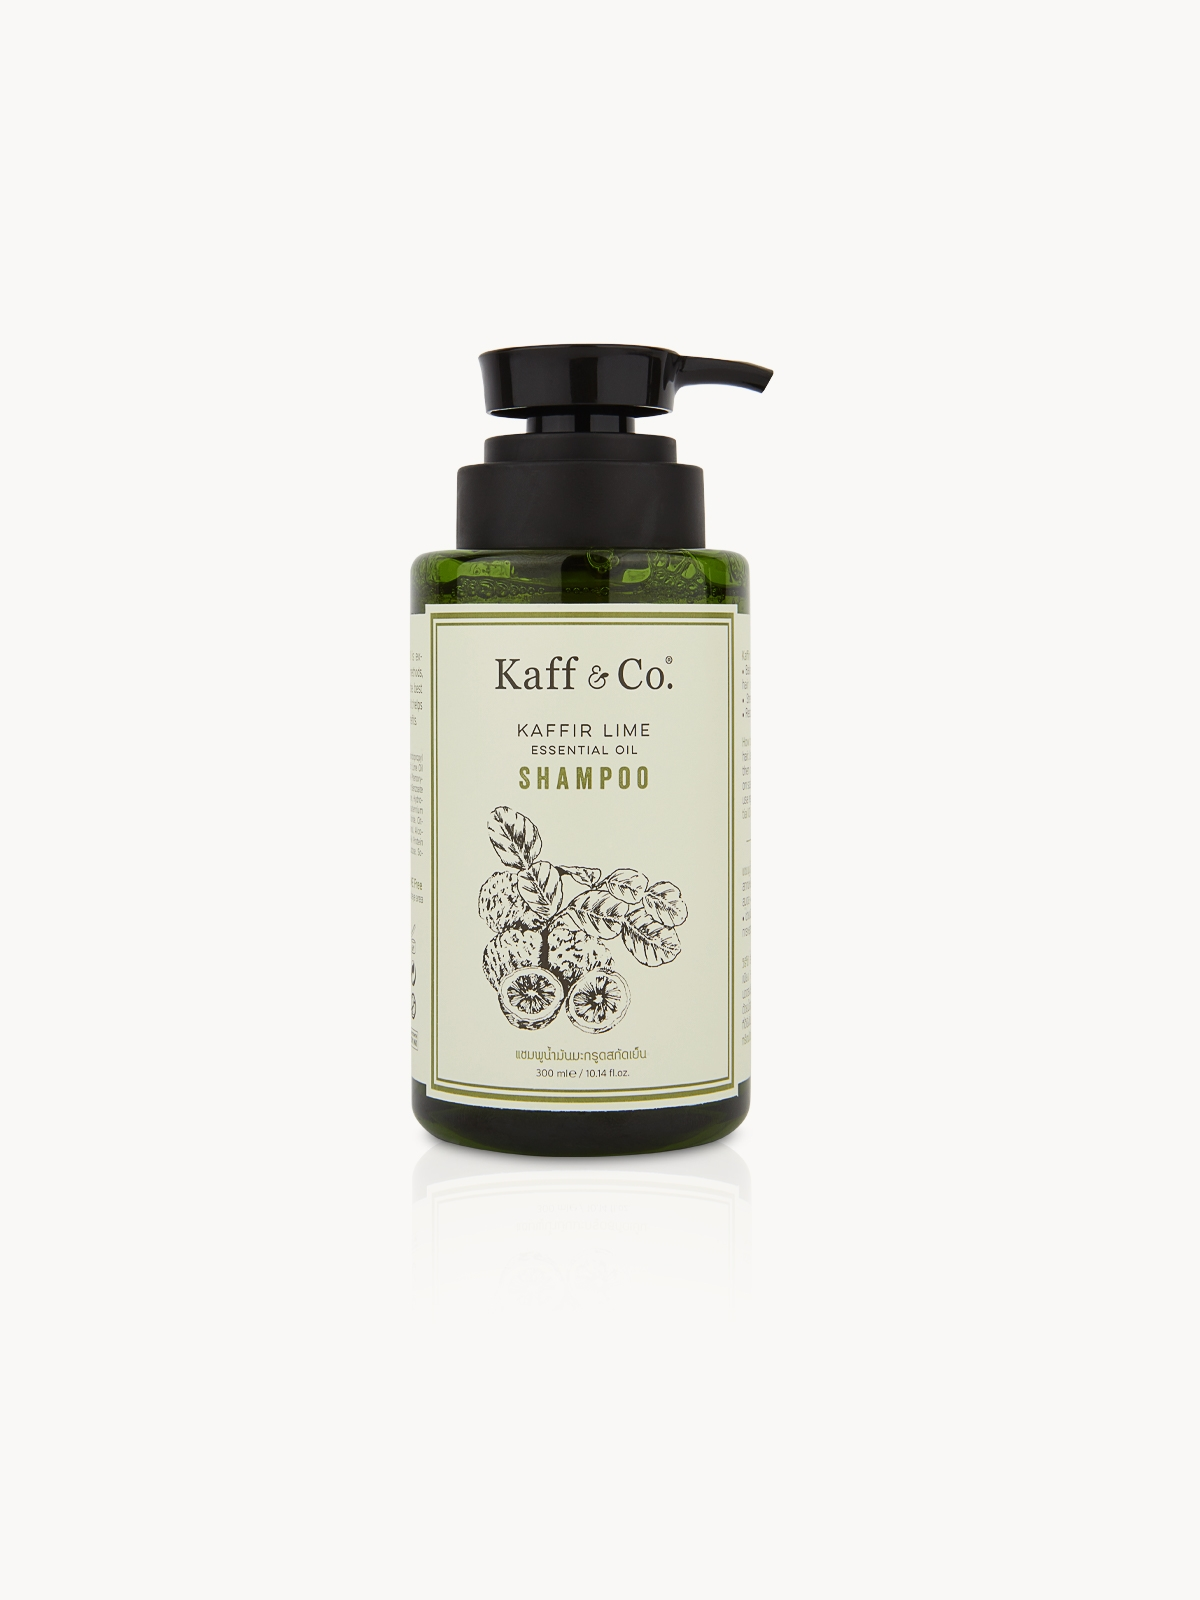 Kaff Co Kaffir Lime Essential Oil Shampoo 300 ml